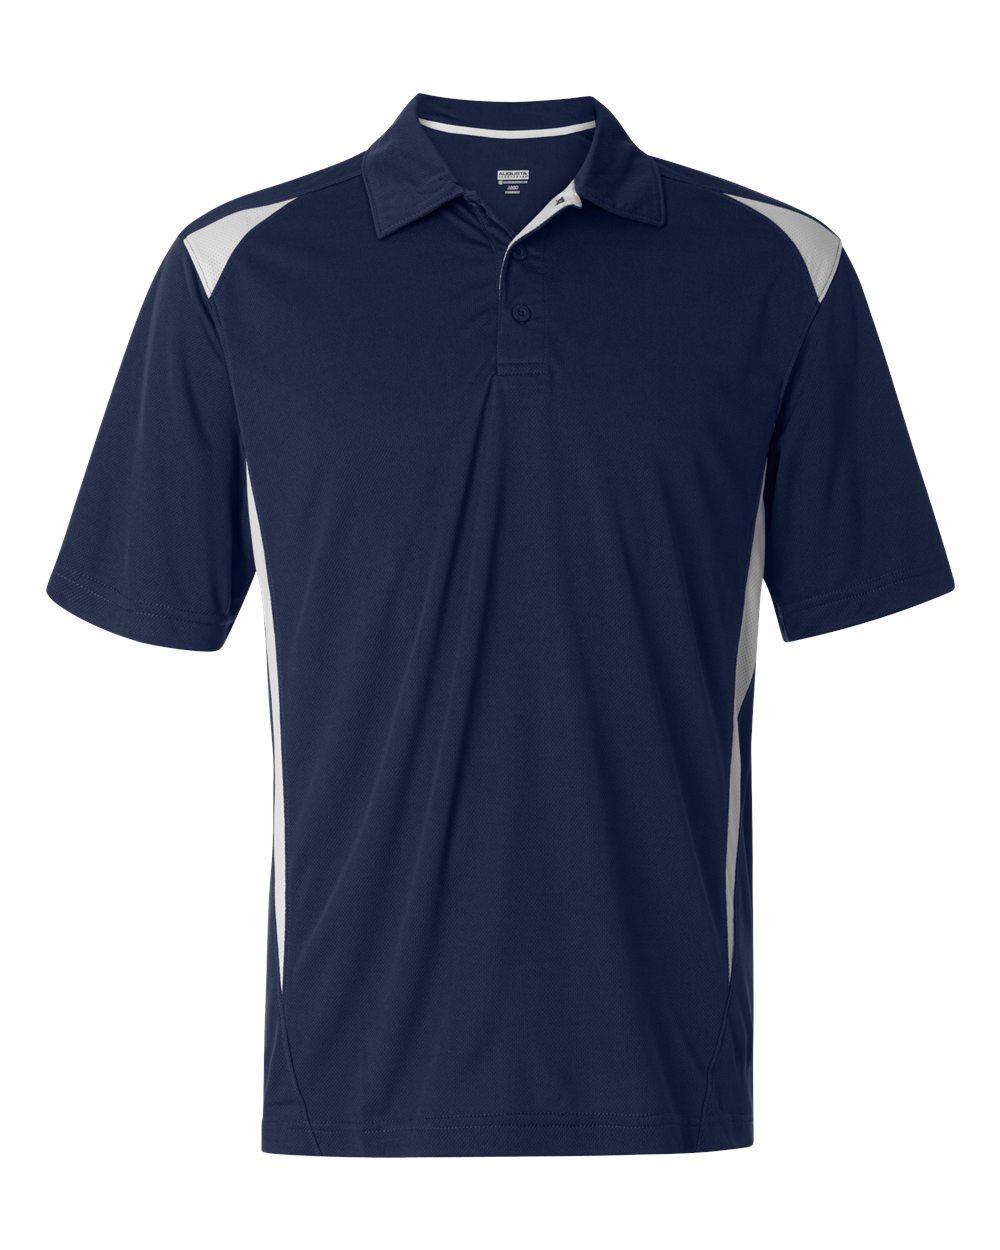 Augusta-Mens-Sportswear-Two-Tone-Premier-Sport-Shirt-5012-up-to-3XL miniature 9